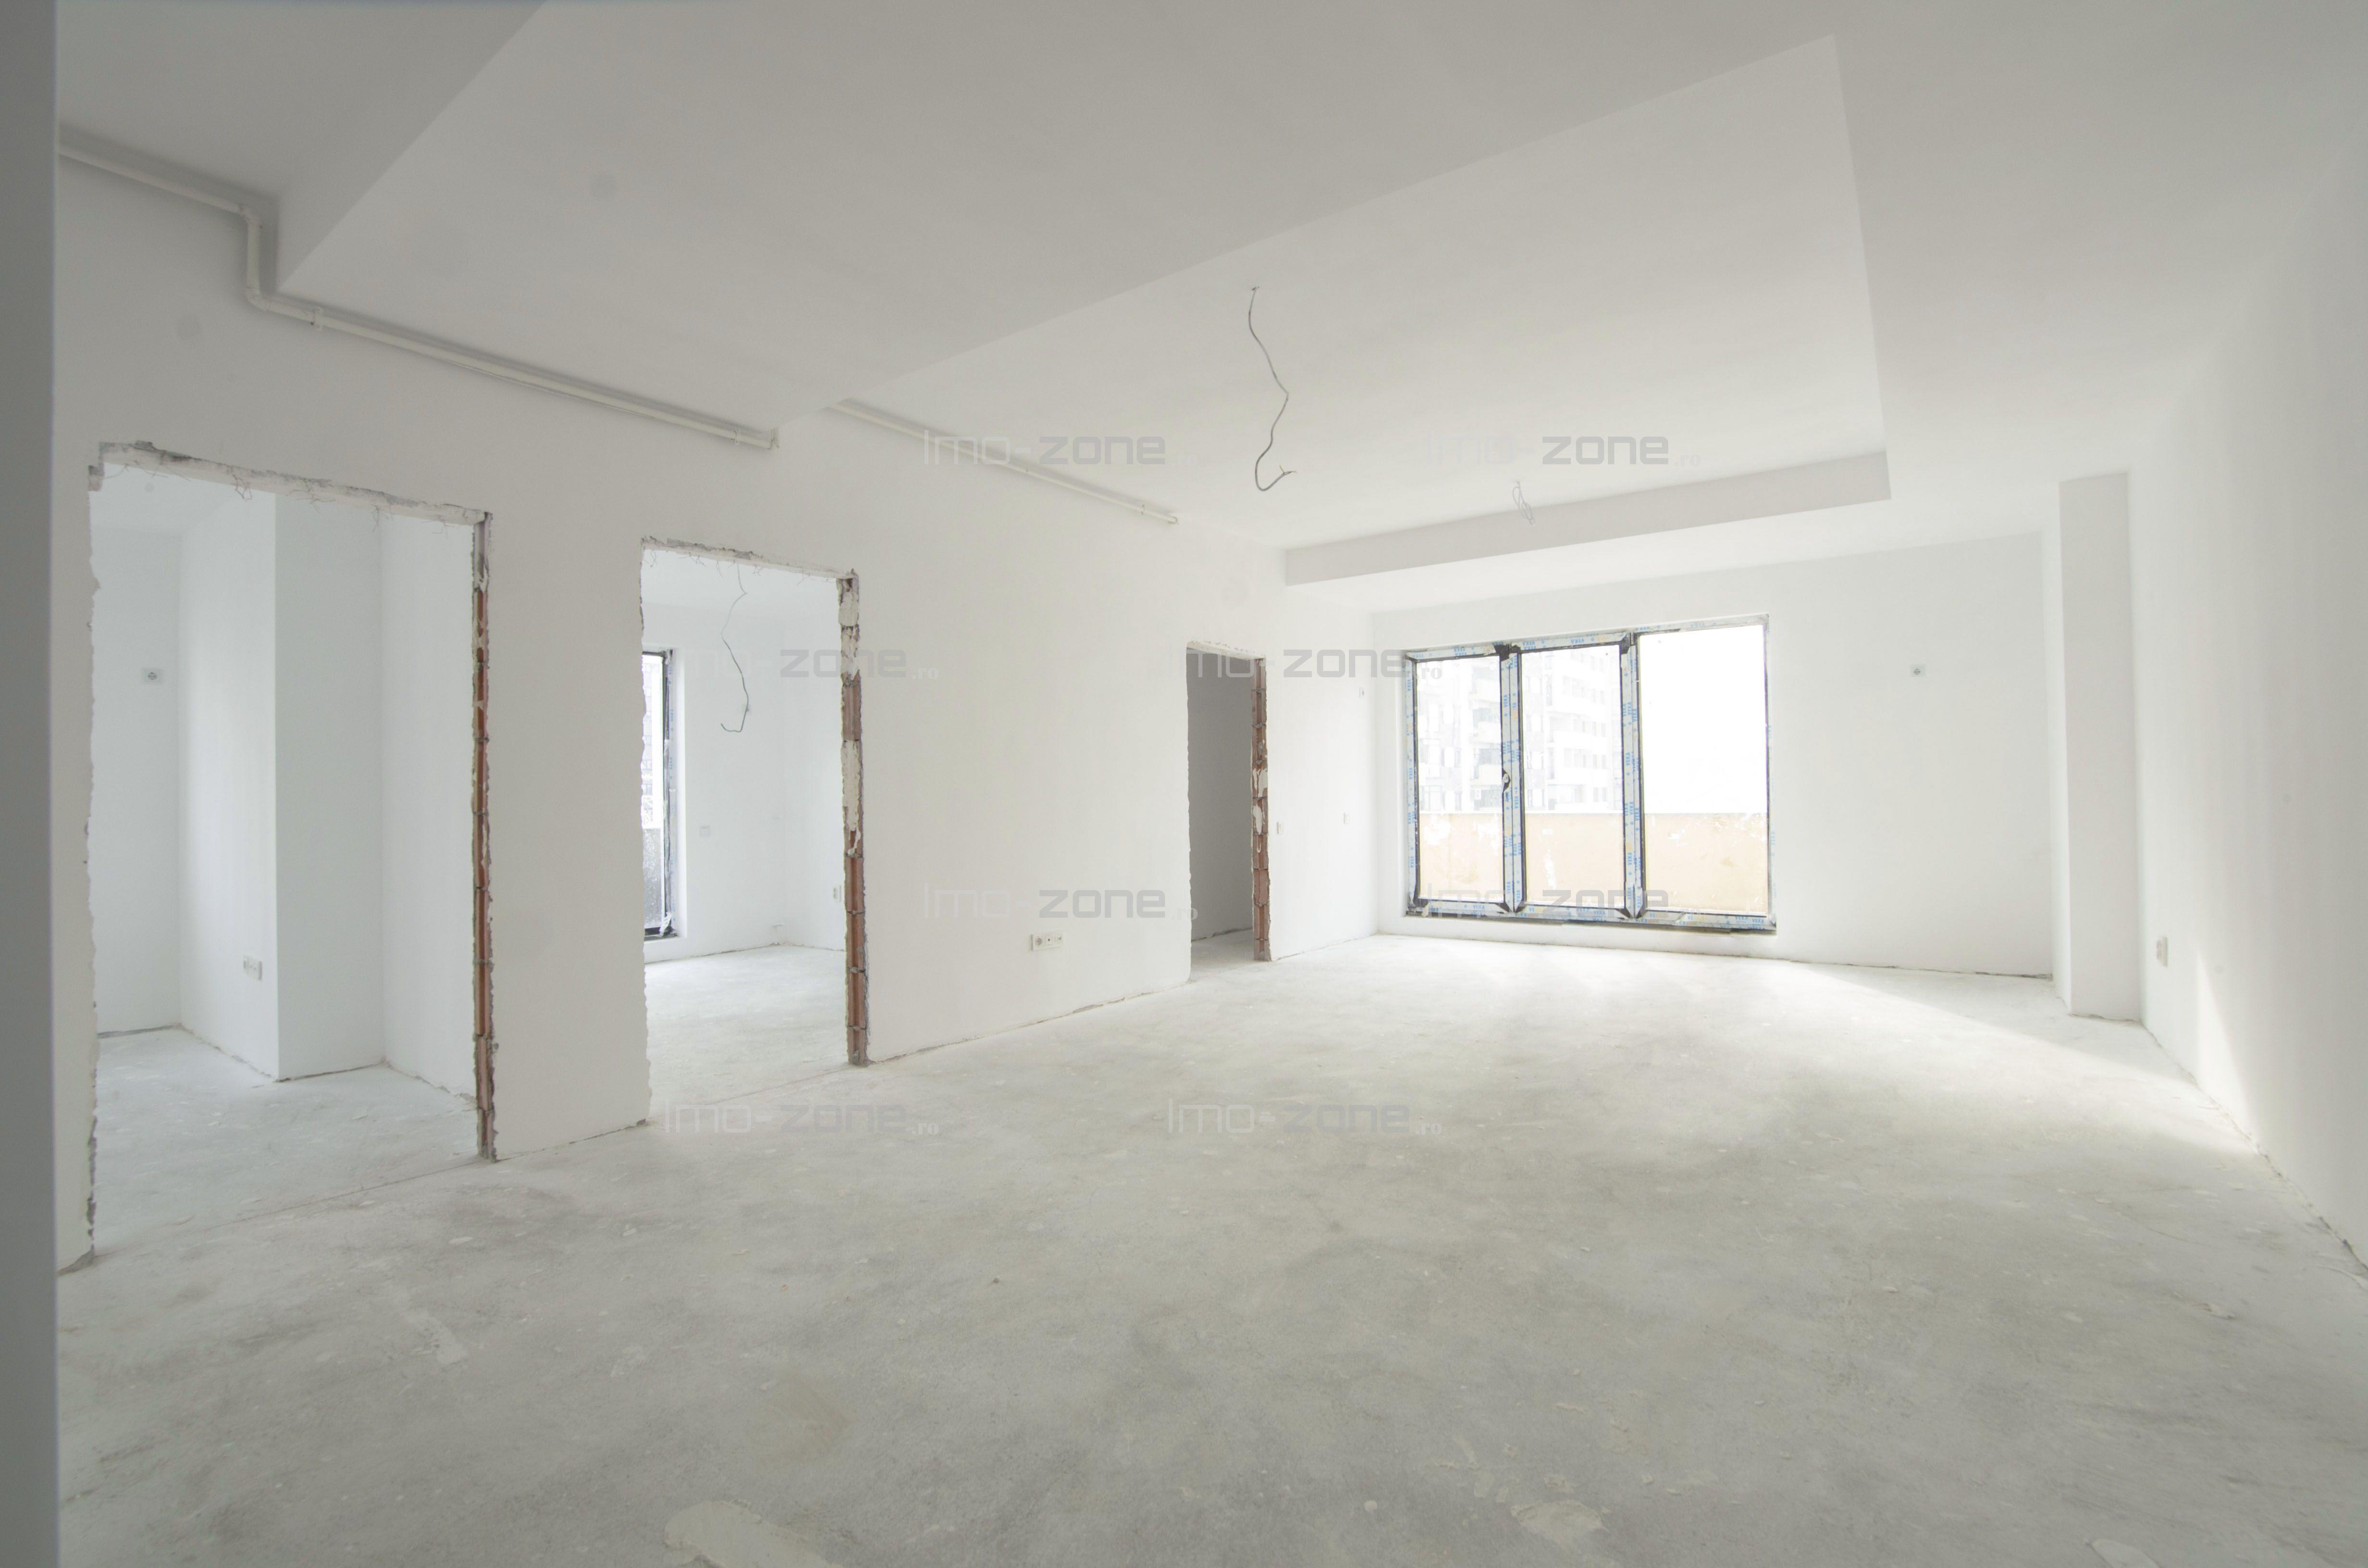 Penthouse, 5 camere, 2bai, vedere panoramica, loc de parcare, PLAZA.